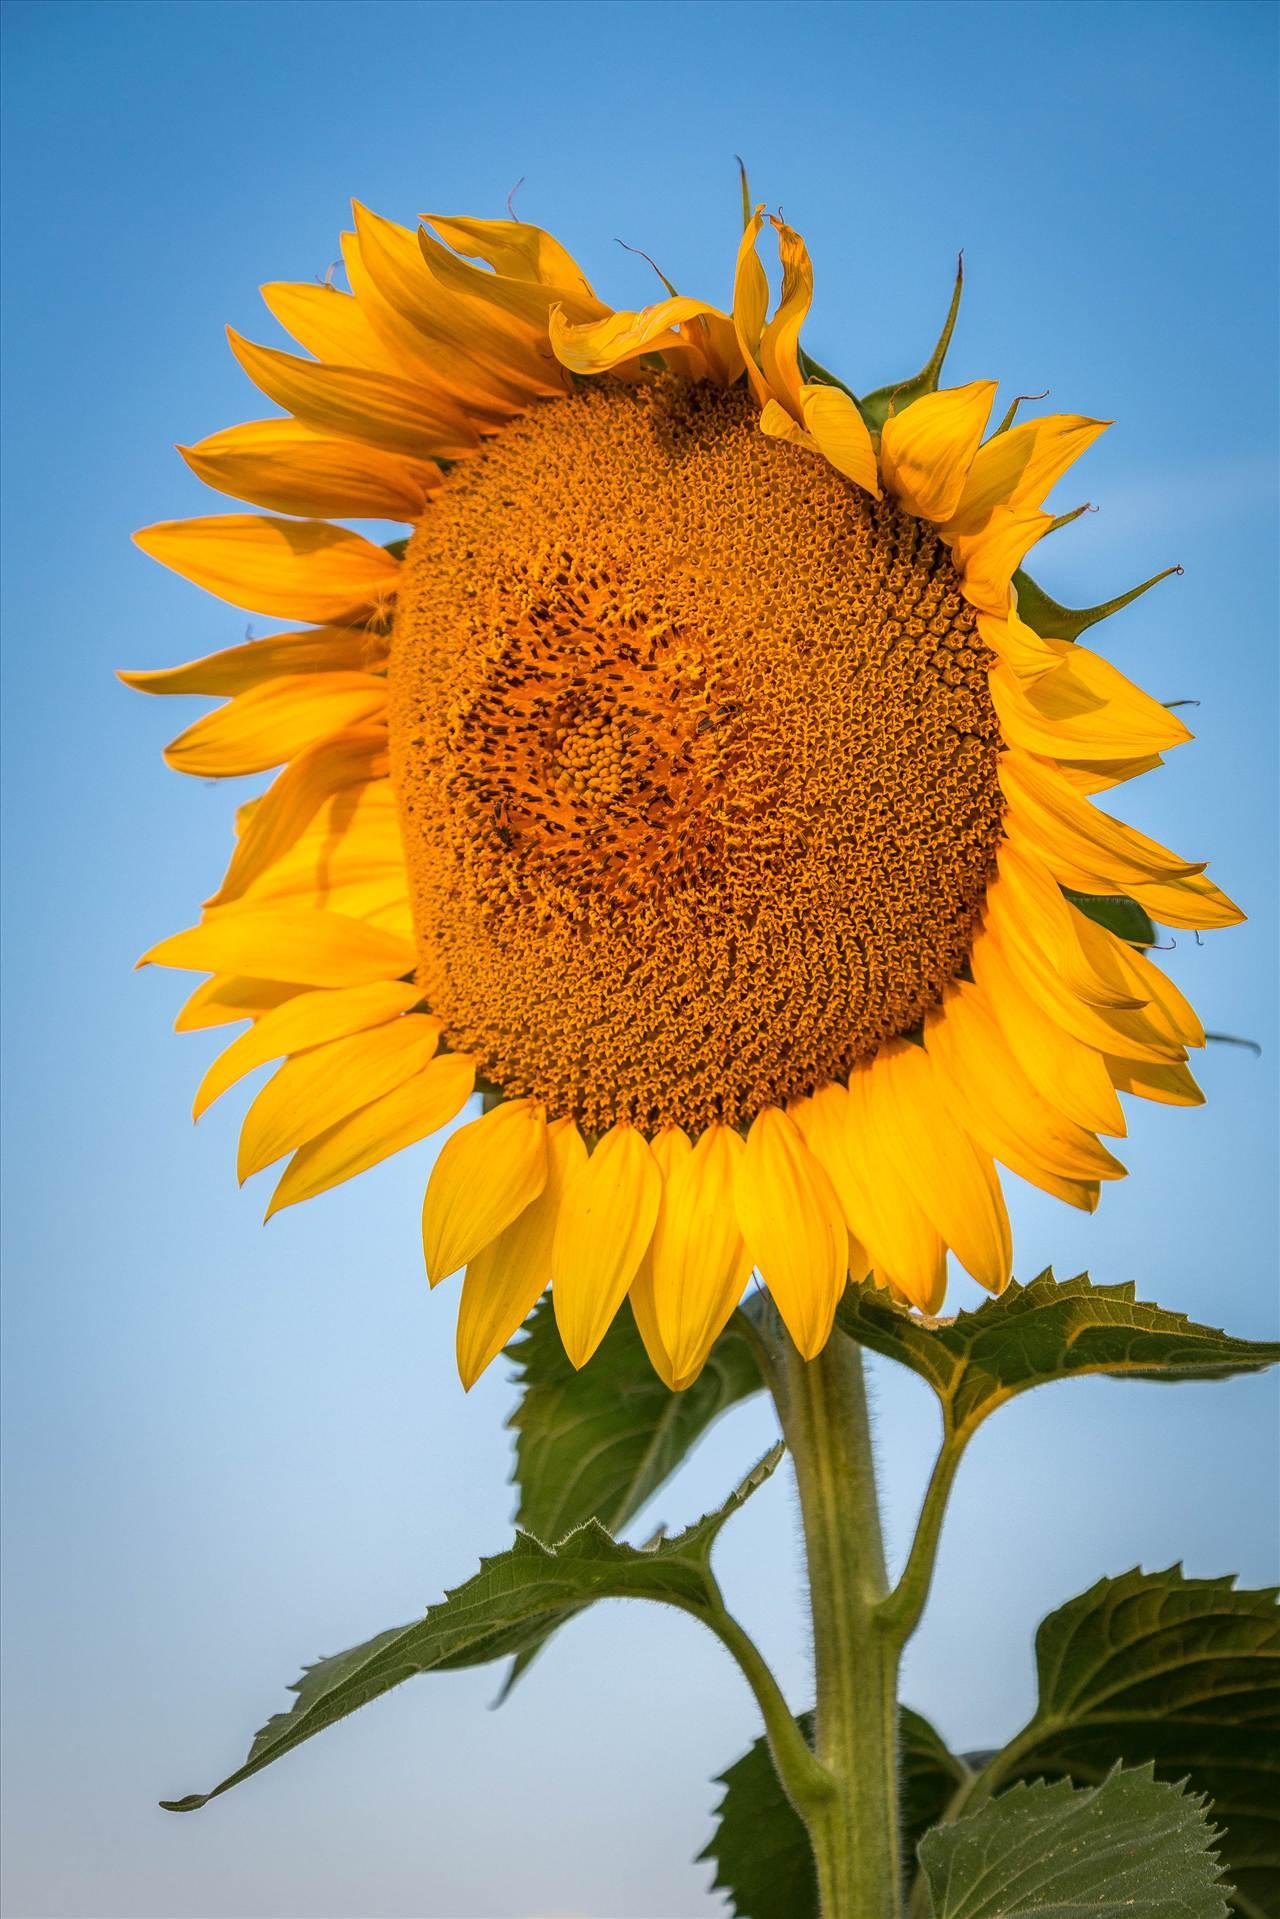 Sunflower Sunrise III - Sunflowers near Denver International Airport. by D Scott Smith